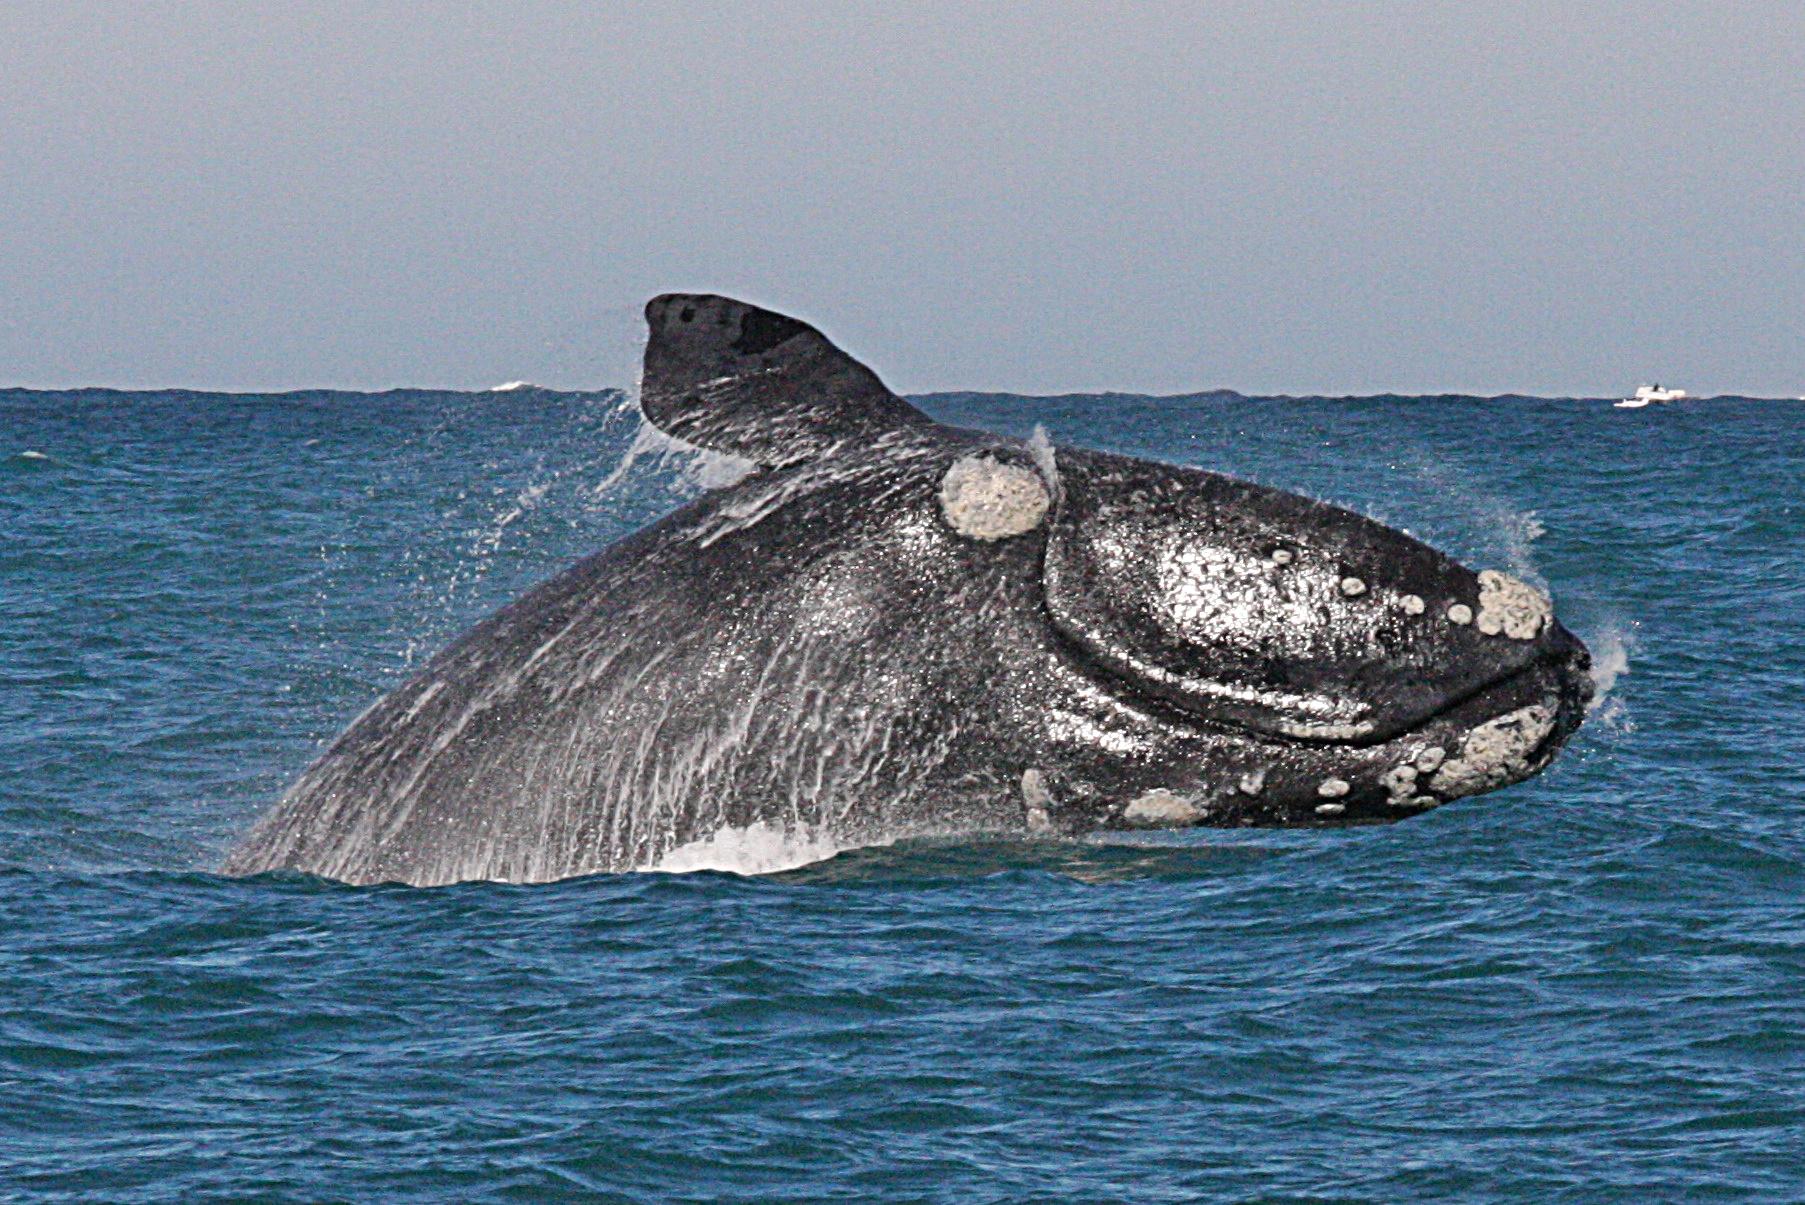 Whale Festival – Celebrating Marine Life